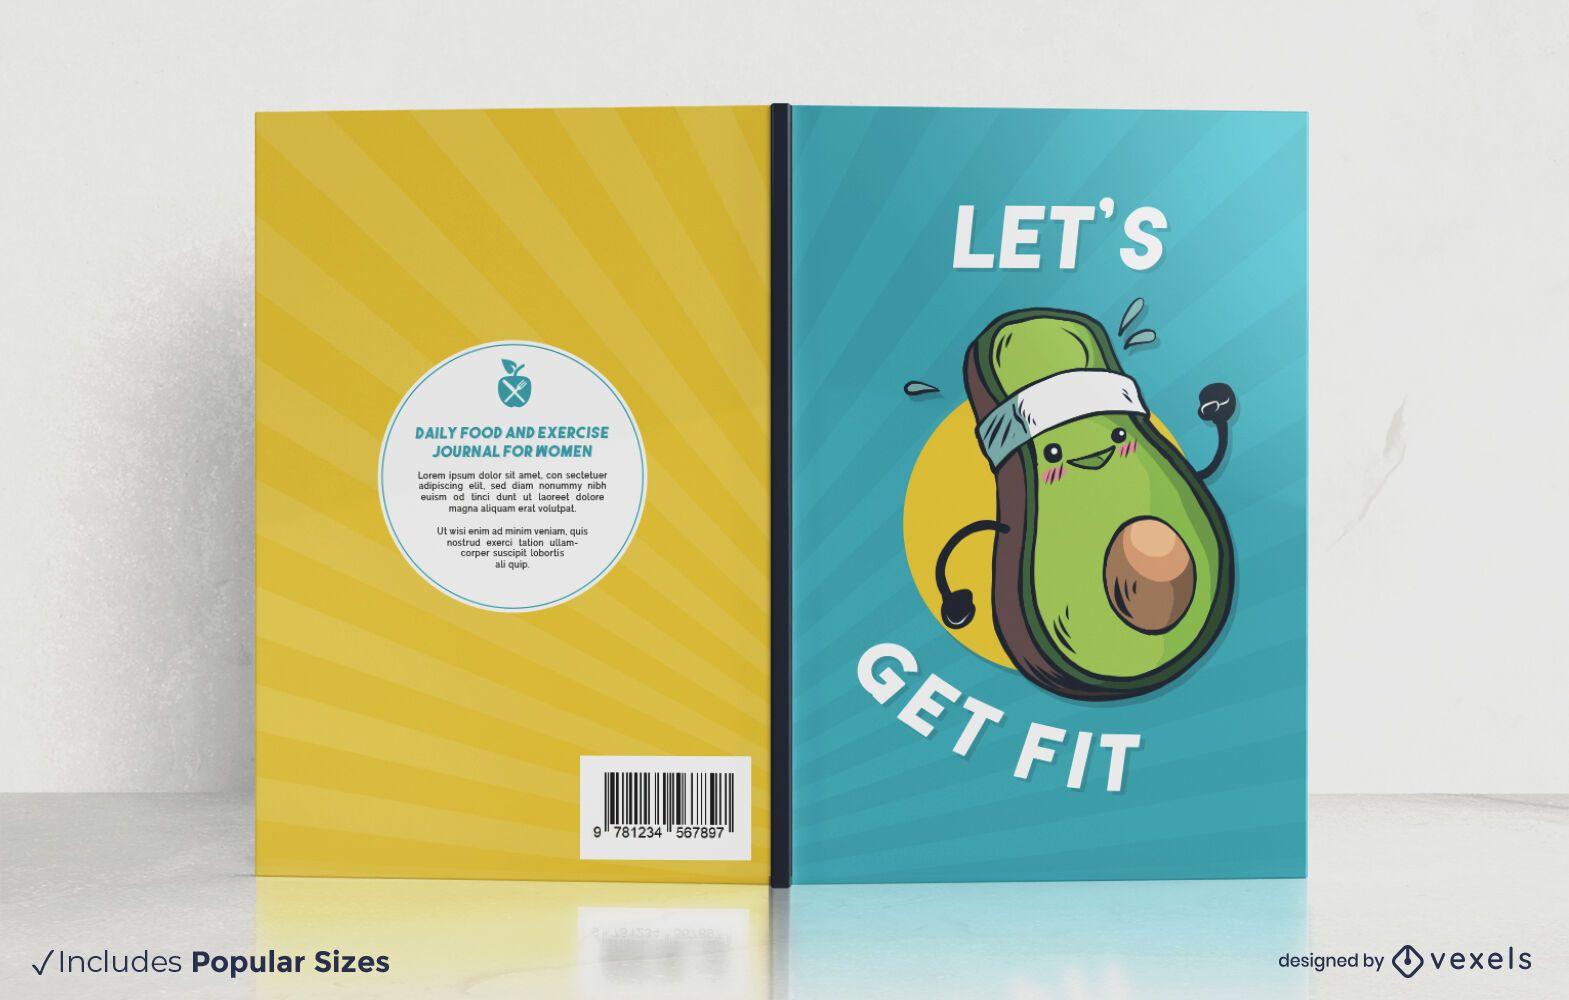 Let's get fit book cover design